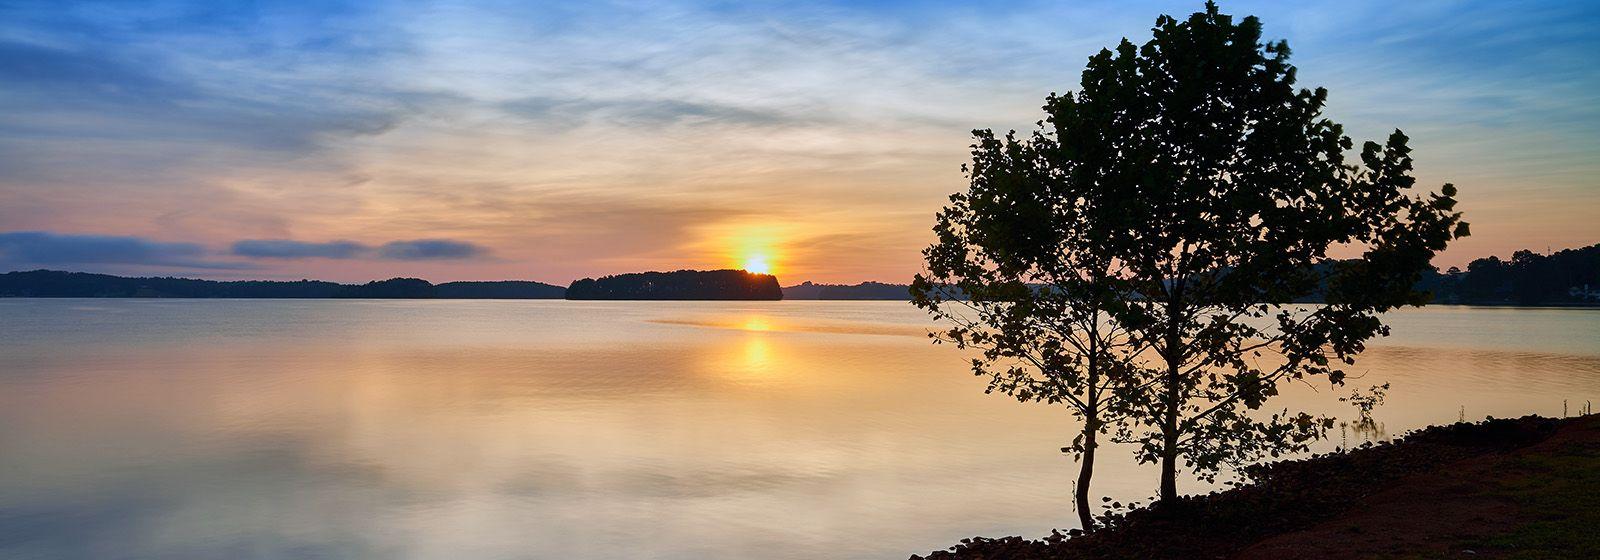 Hydro plant on Lake Keowee helps power upstate South Carolina